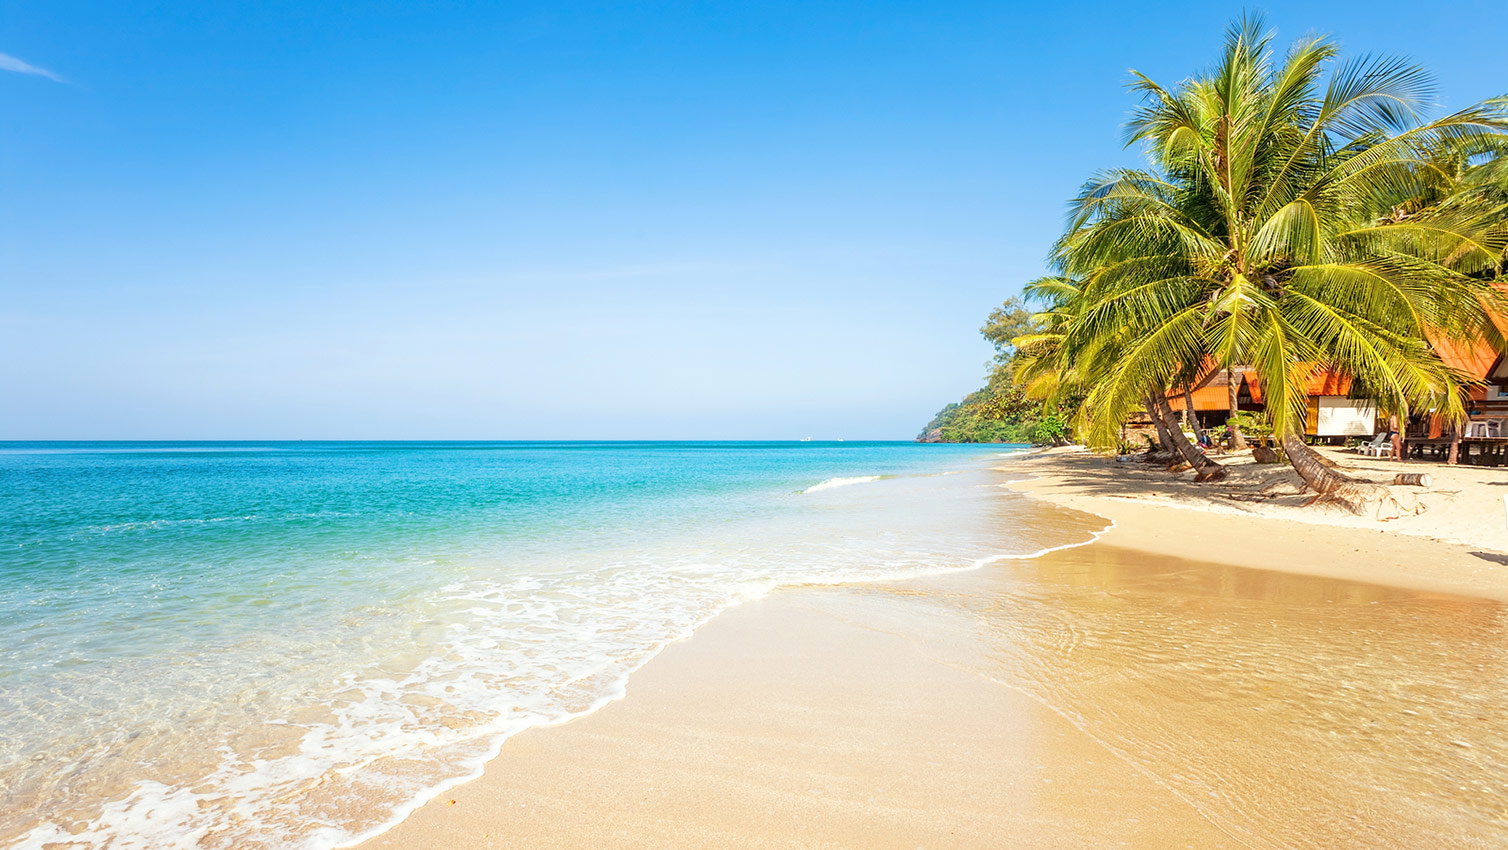 Brasil Destino de Turismo